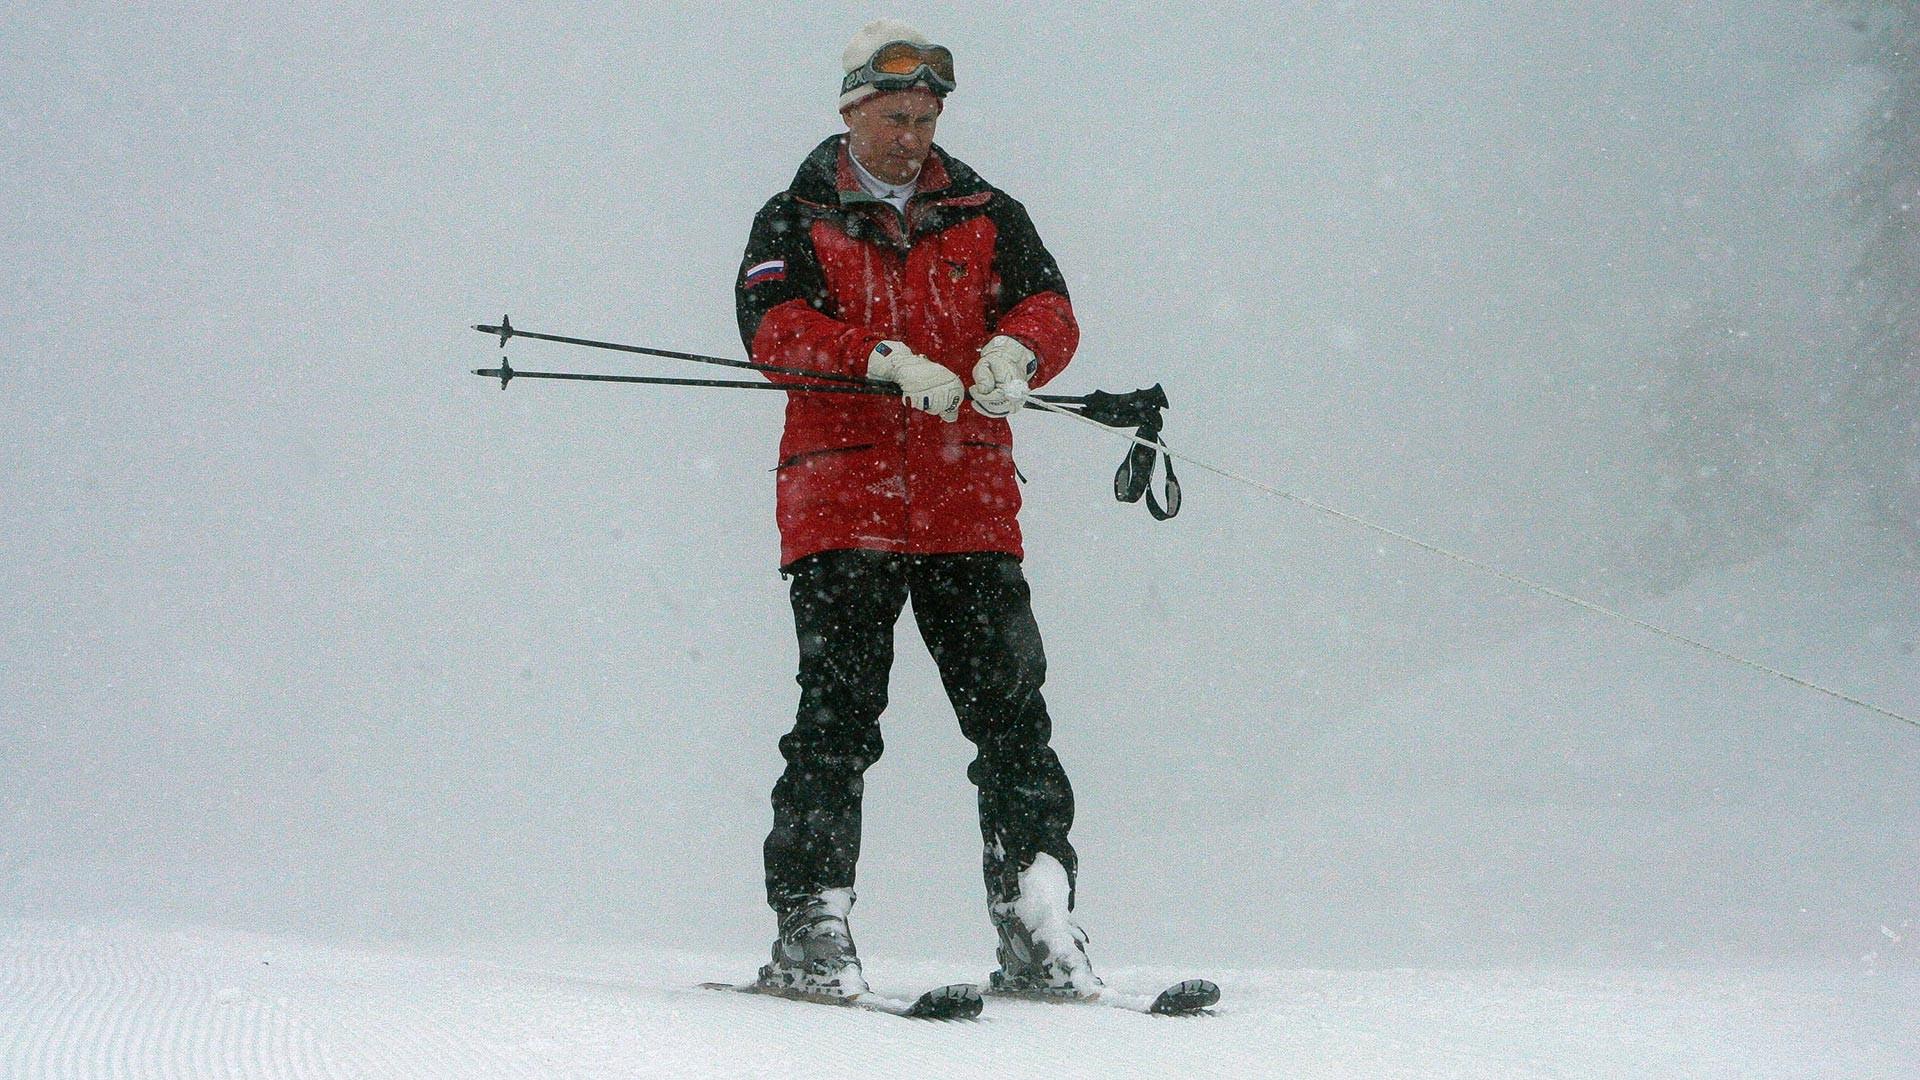 Руският президент Владимир Путин на посещение в туристически комплекс в ски курорта Красная поляна.